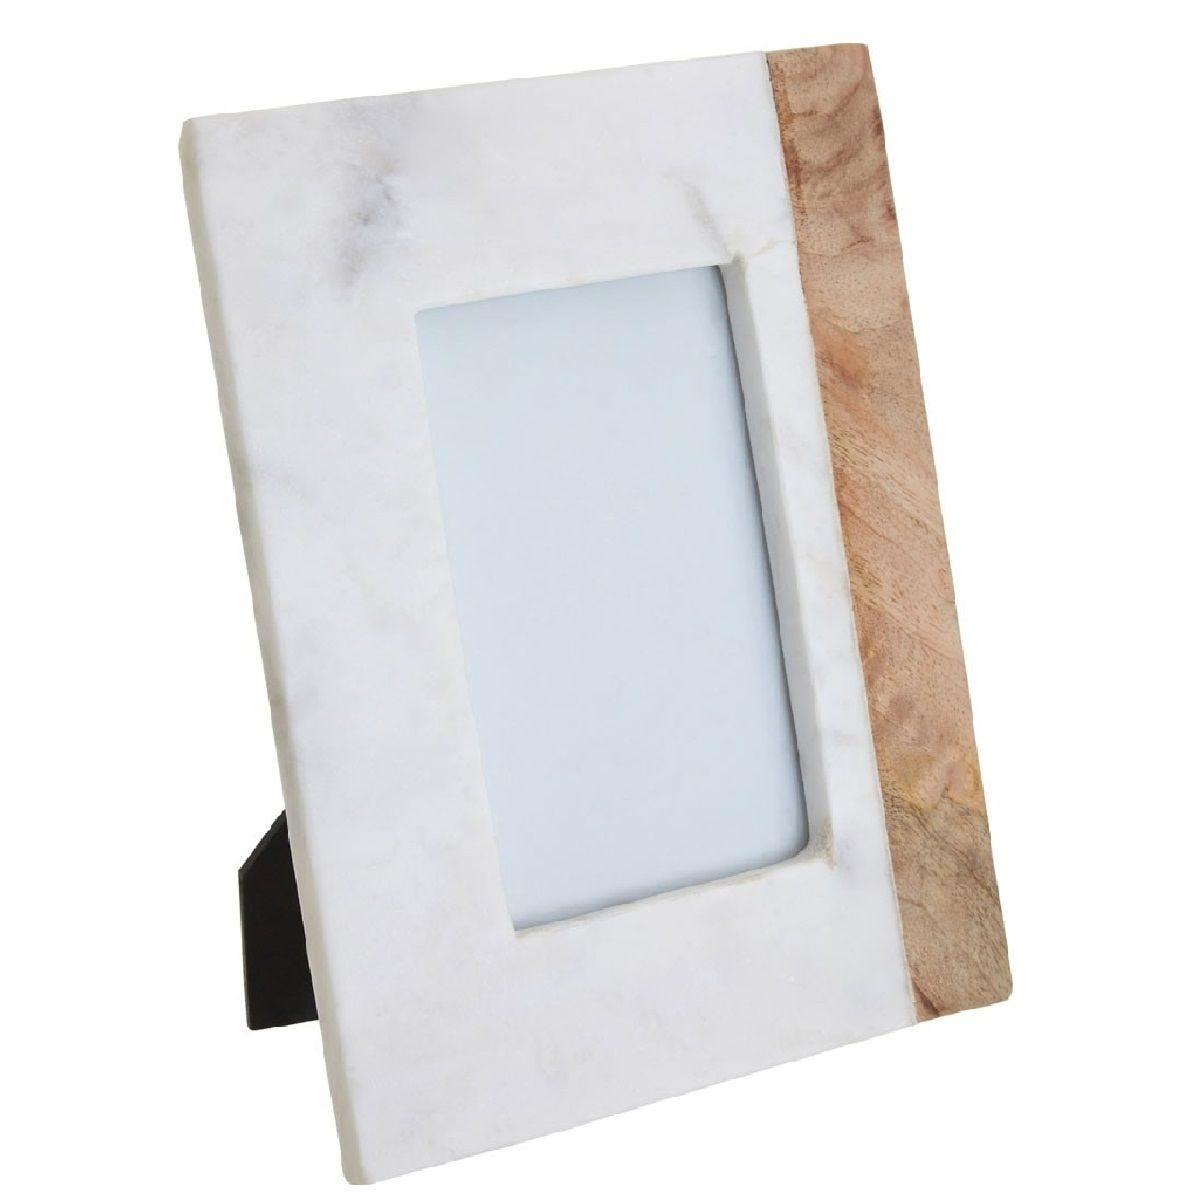 Premier Housewares Sena Photo Frame (4In X 6In) - White Marble Mango Wood